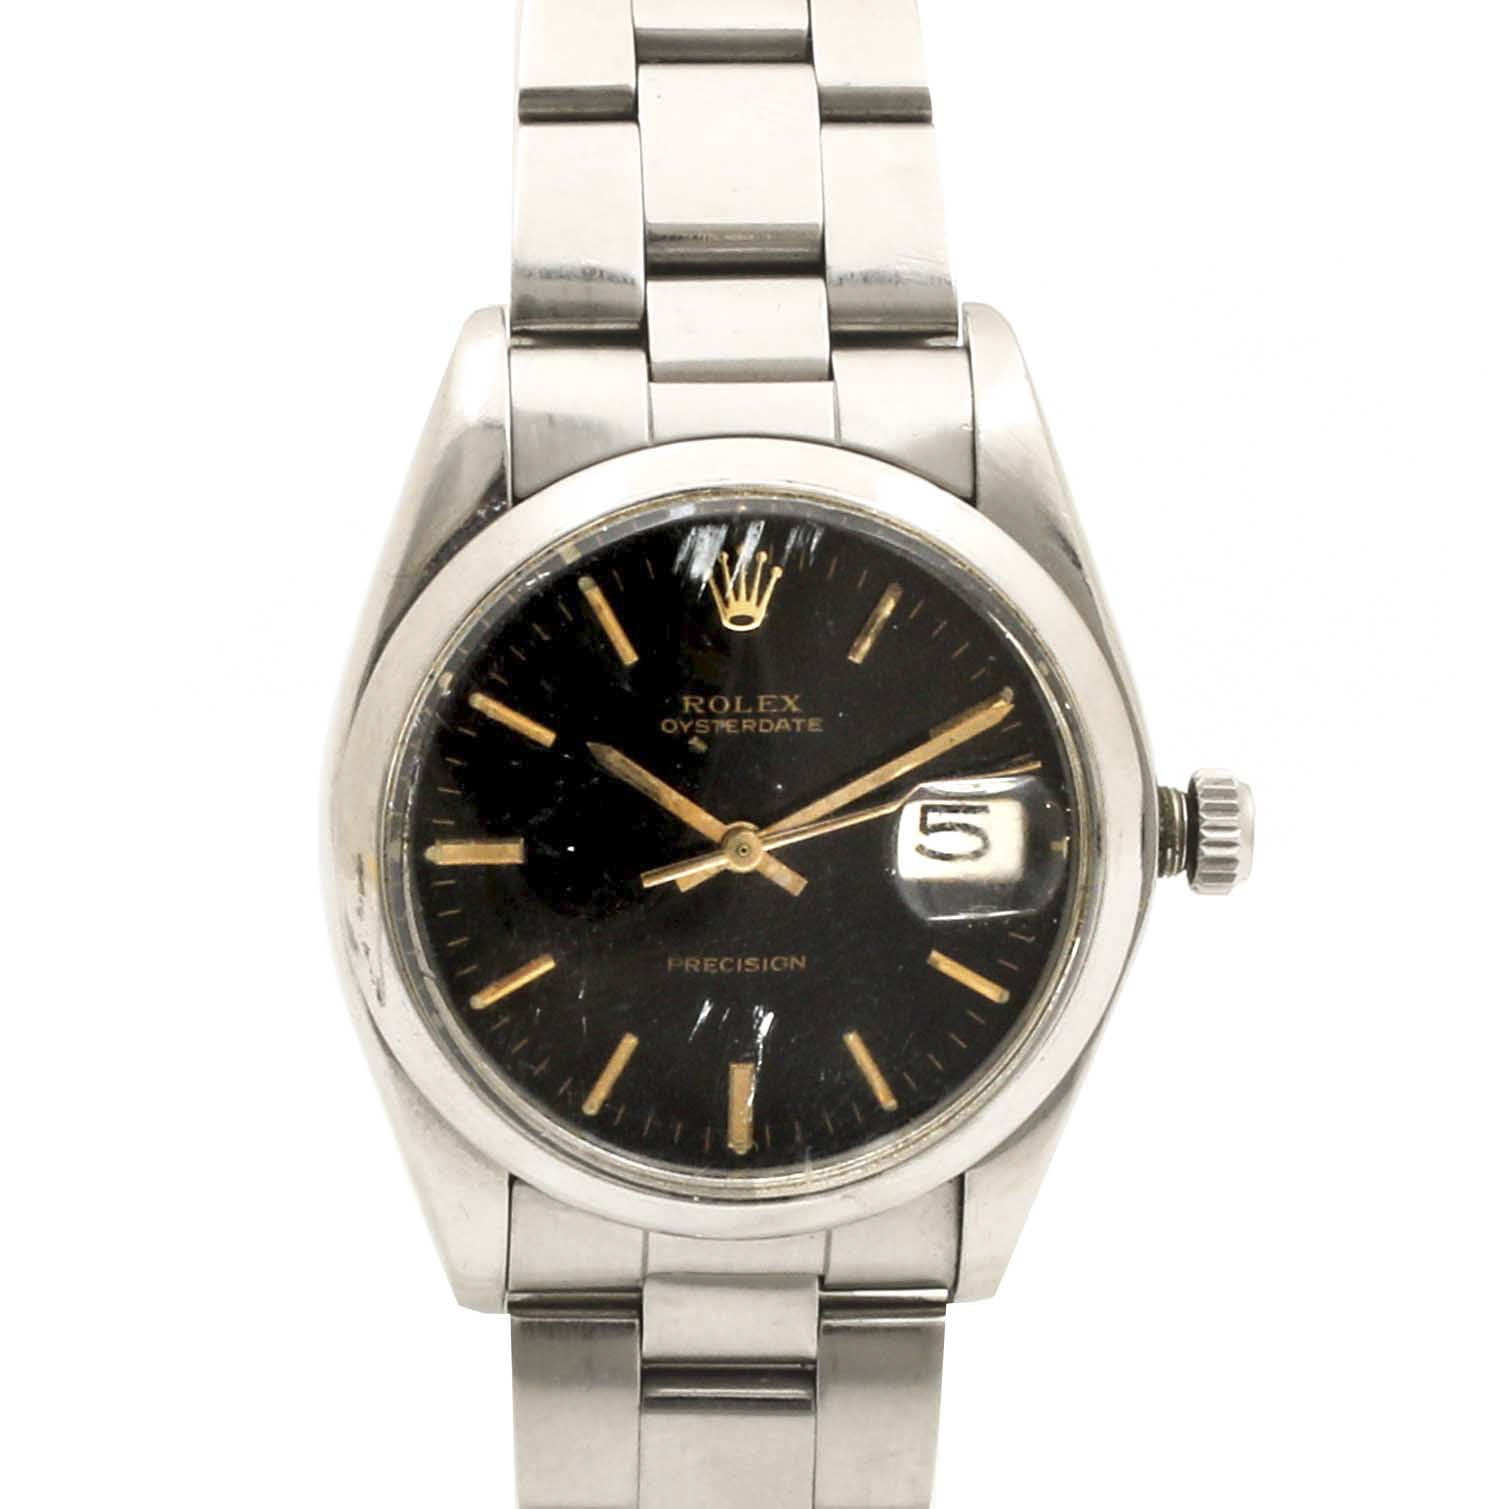 Rolex Oysterdate Precision Wristwatch